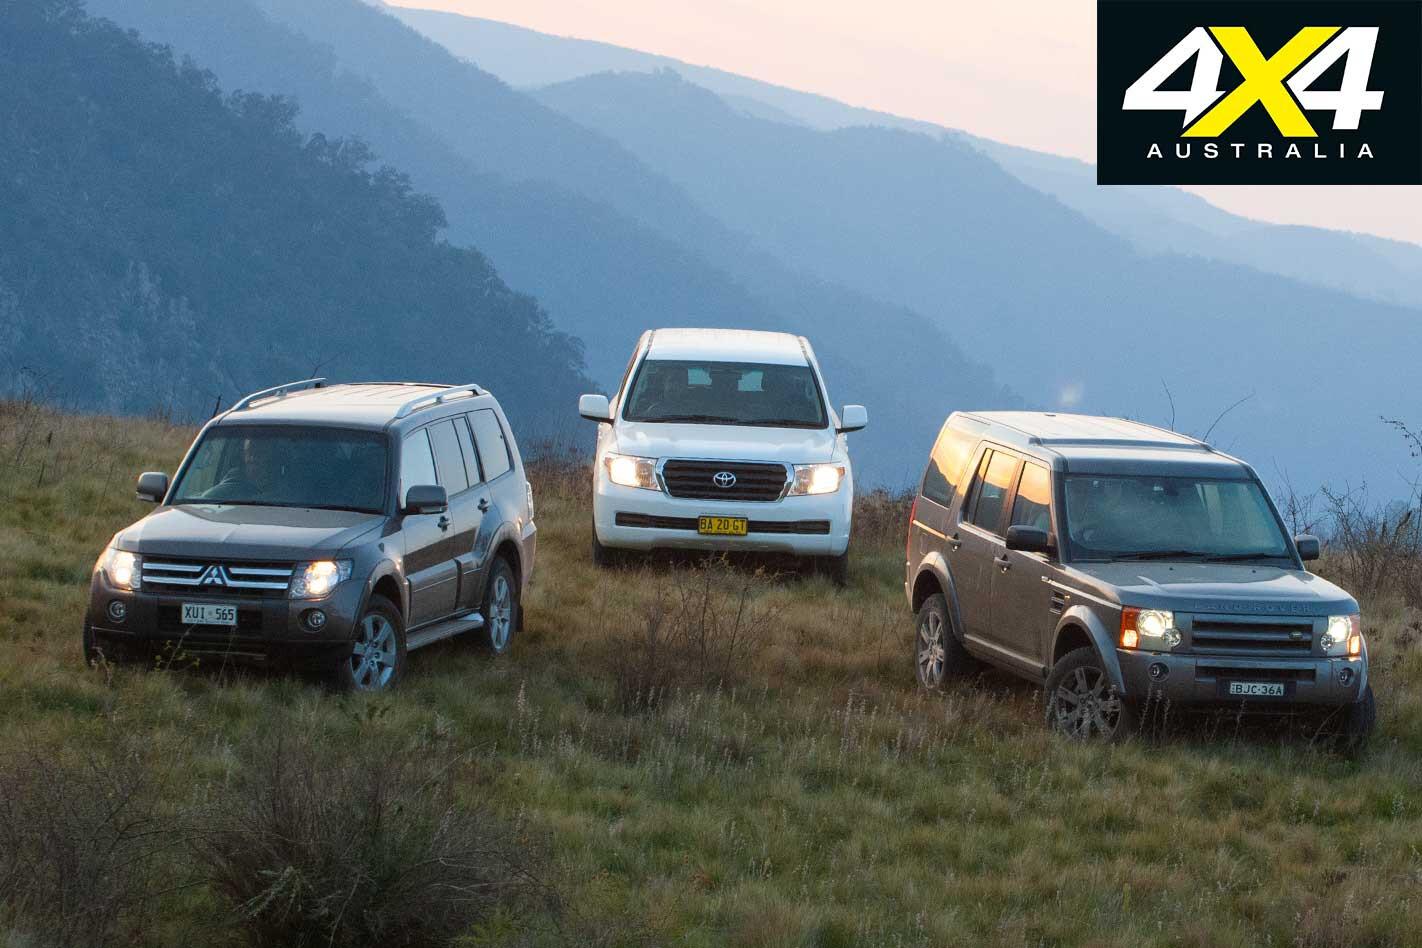 2009 Land Rover Discovery 3 Vs Toyota Land Cruiser Vs Mitsubishi Pajero 4 X 4 Comparison Specifications Jpg